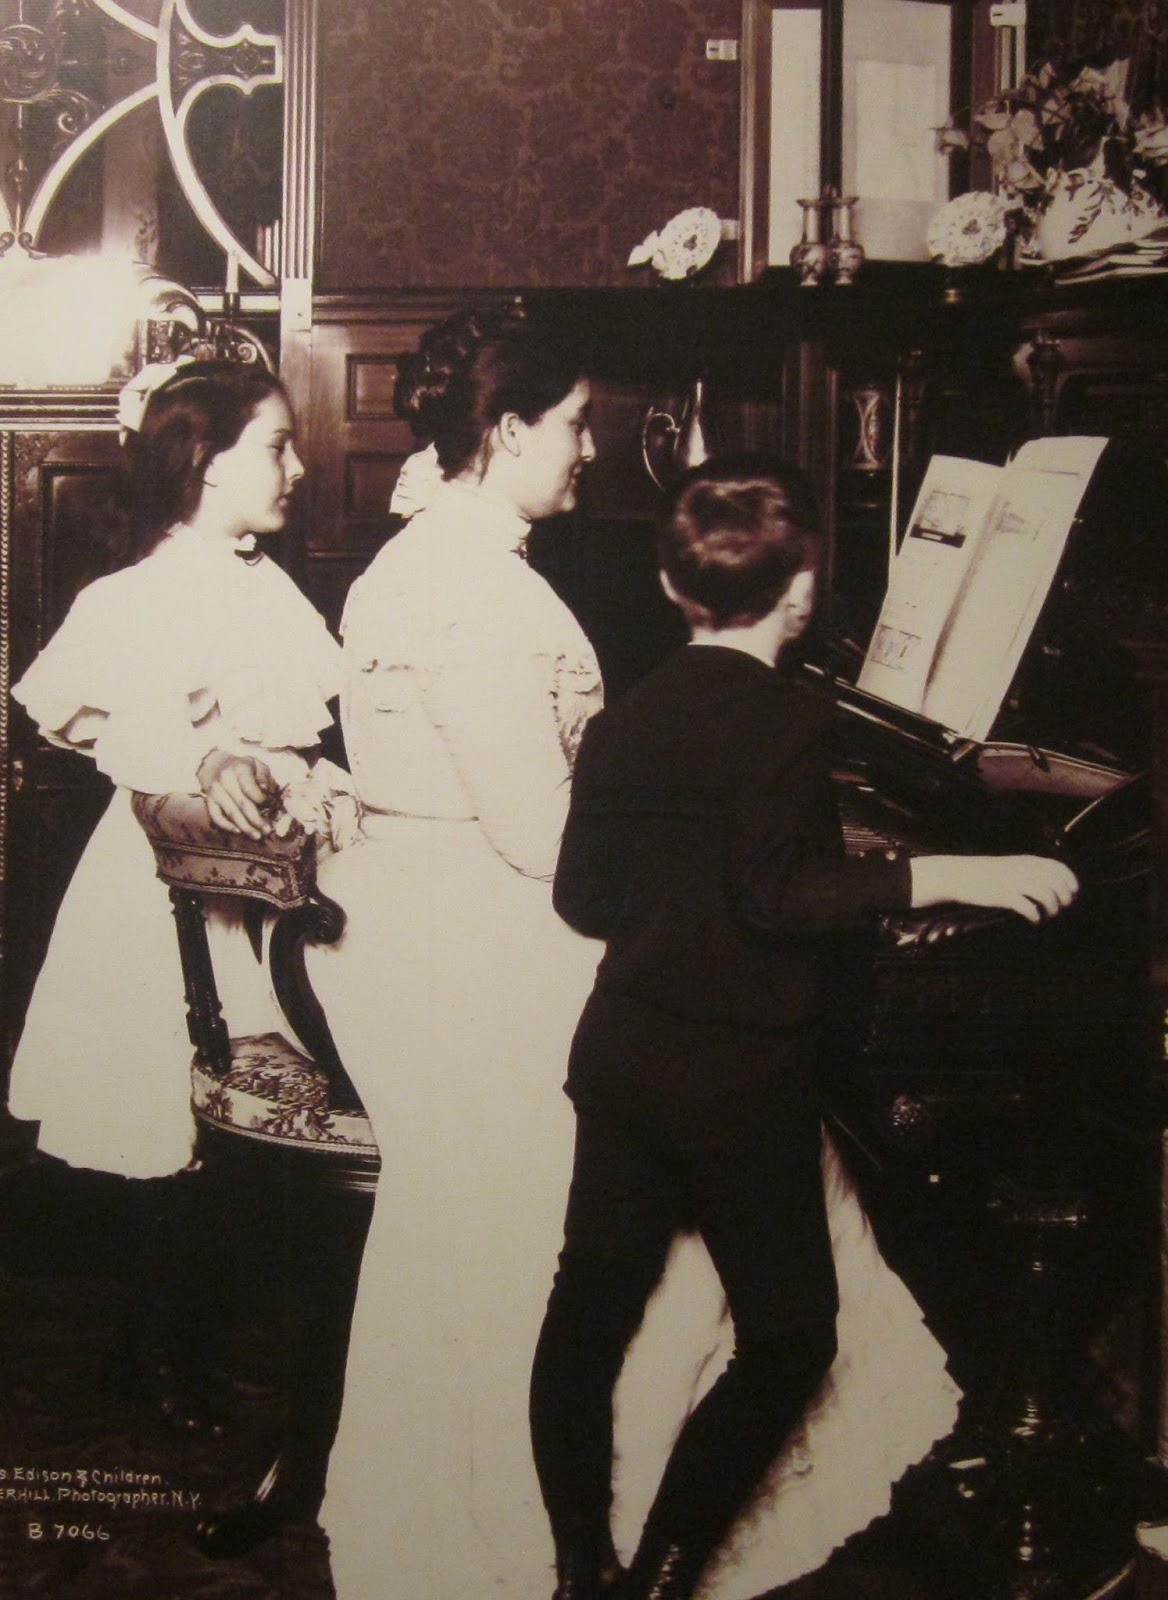 Mikel Agirregabiria: Madres de genios: Caso de Thomas Edison